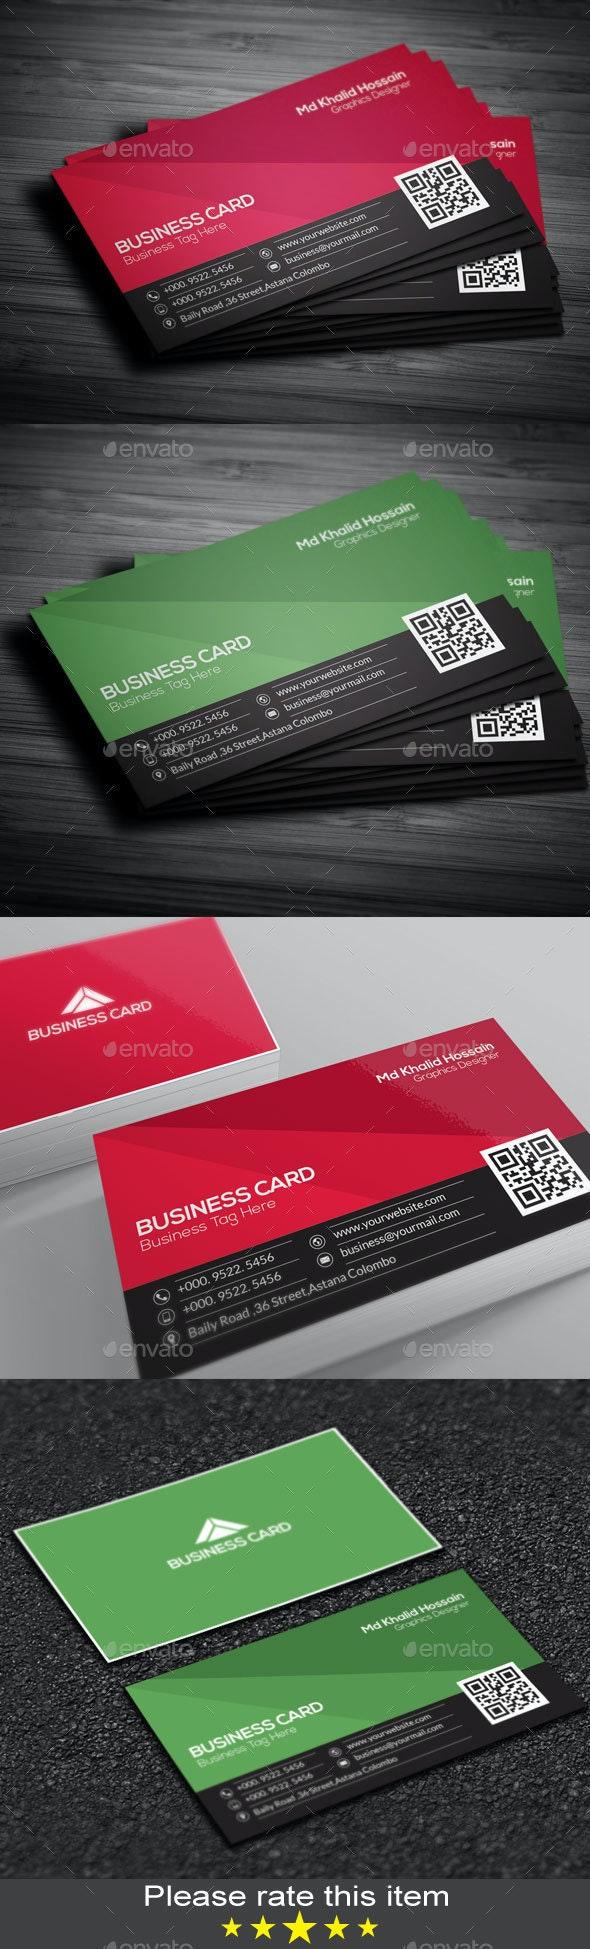 Creative Identity Business Card - Creative Business Cards